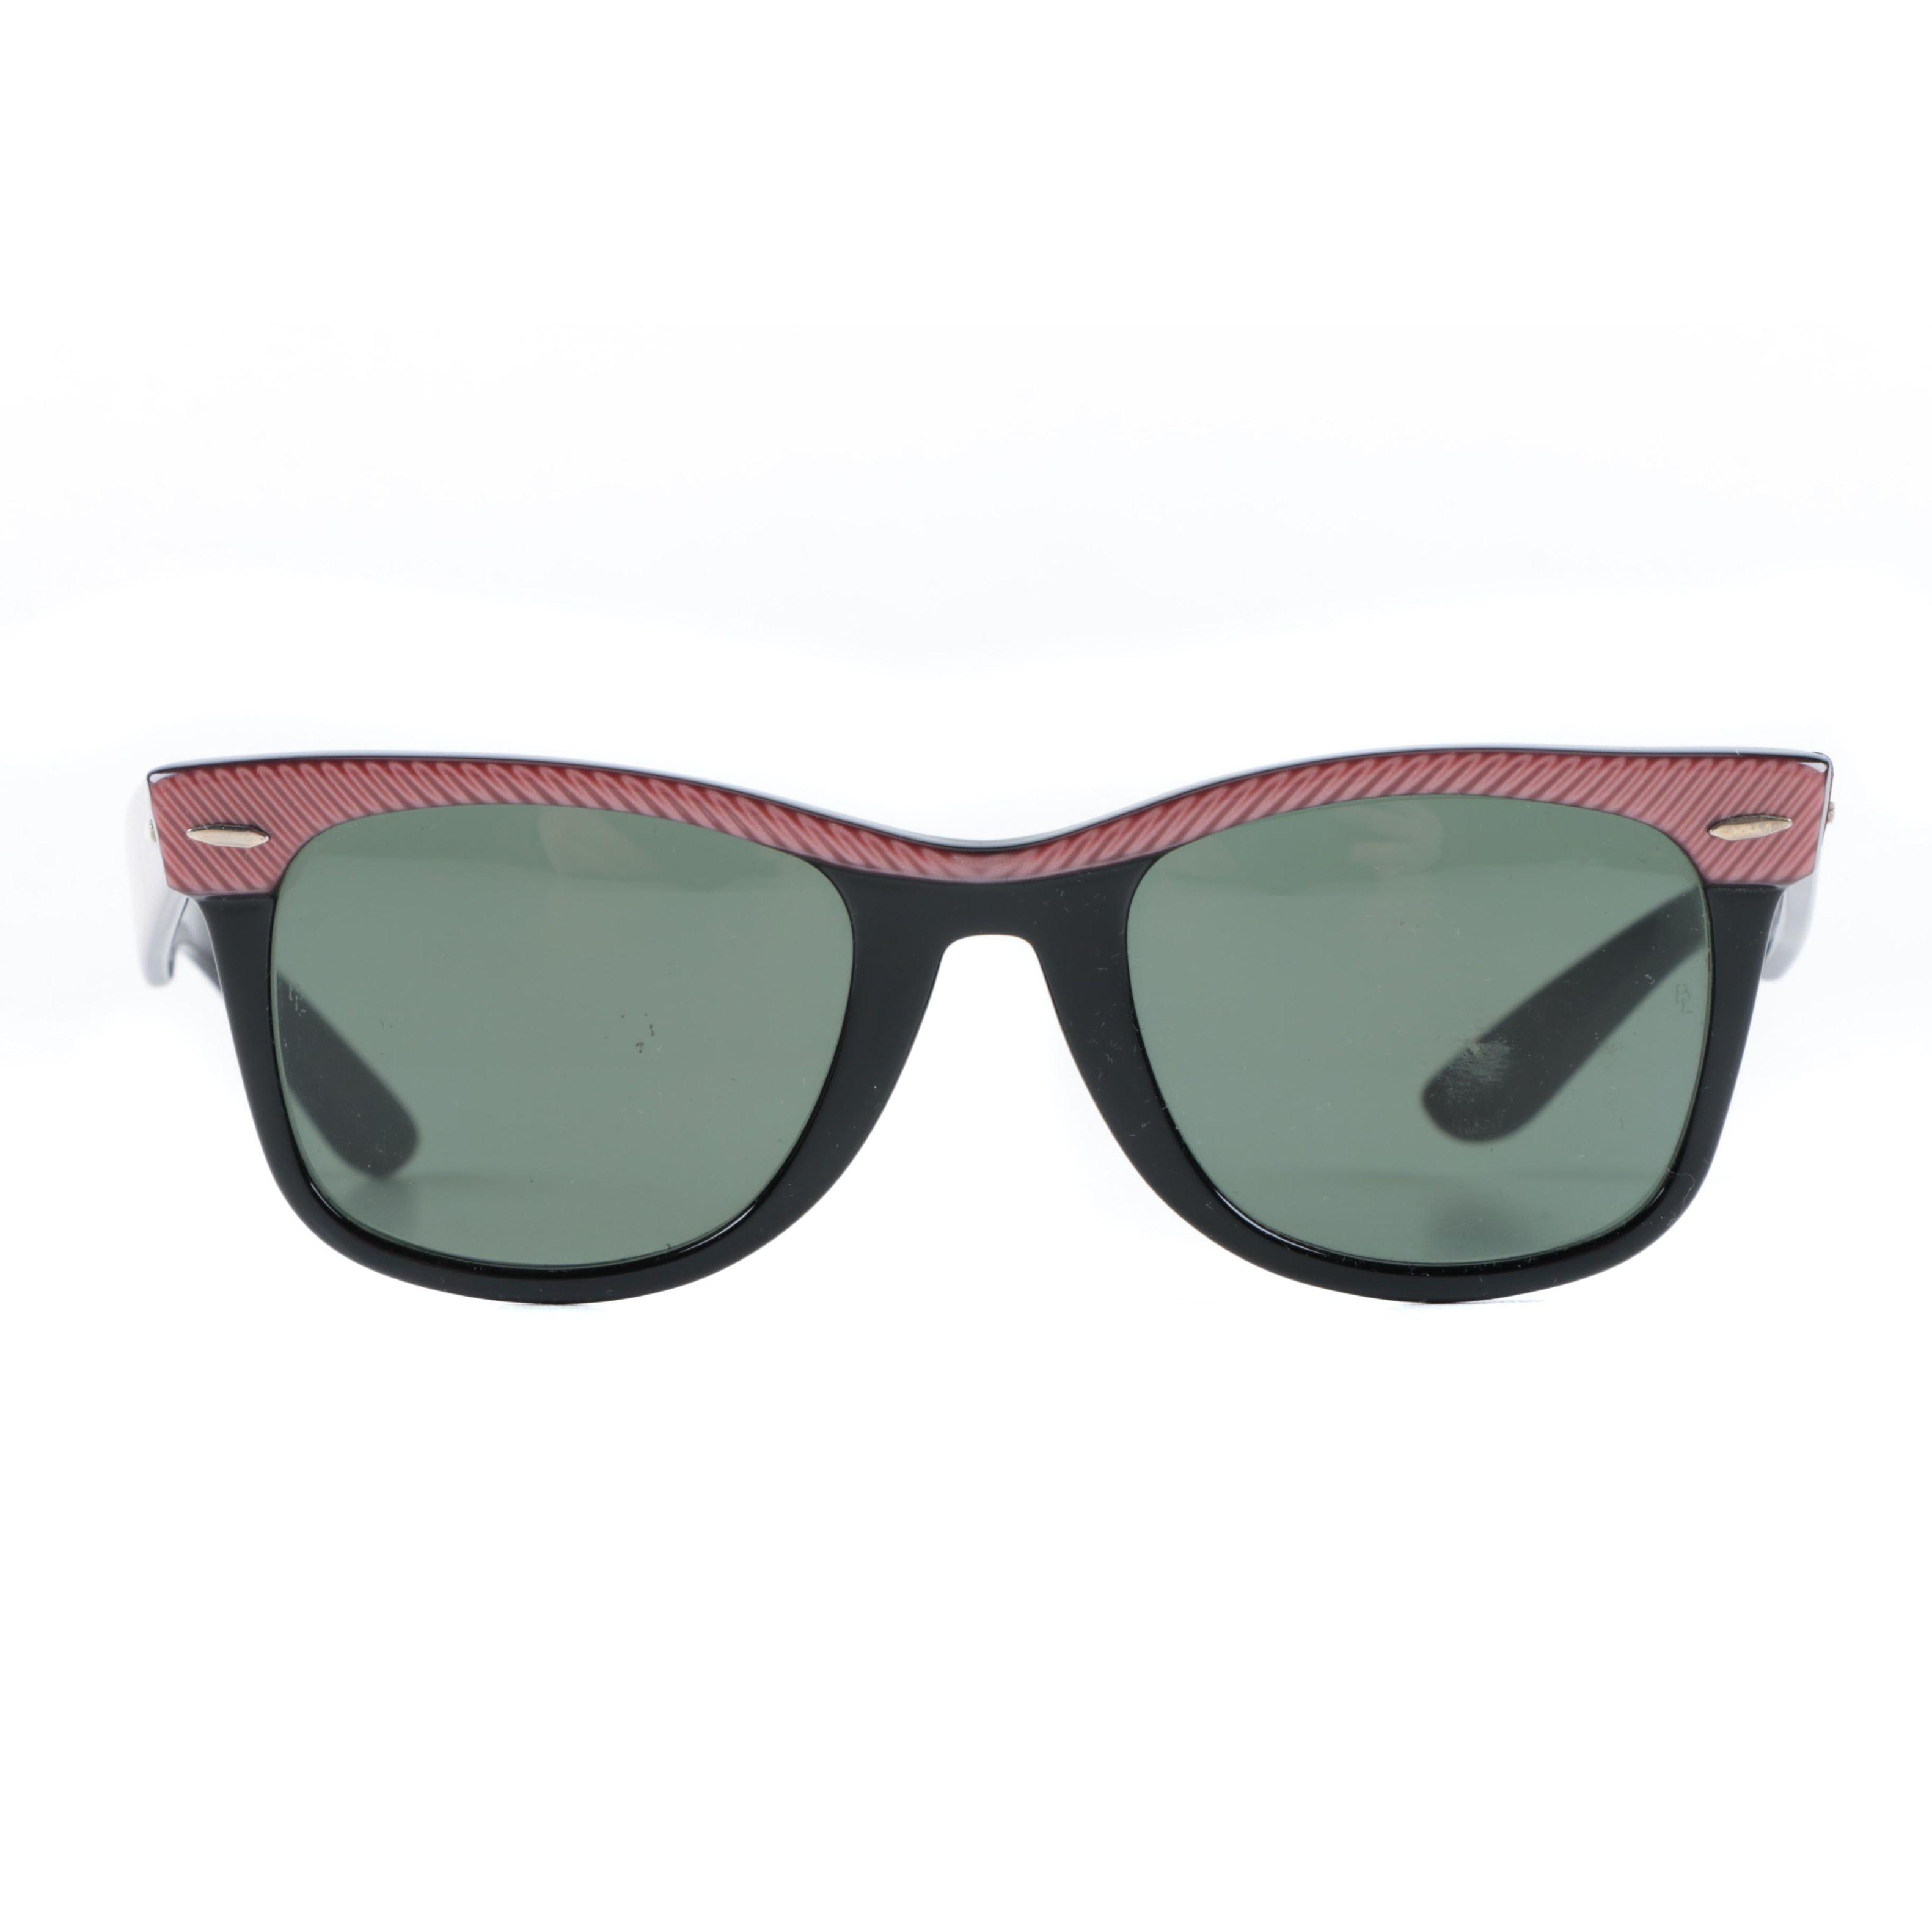 1980s Vintage Ray-Ban Bausch & Lomb Two Tone Wayfarer Sunglasses